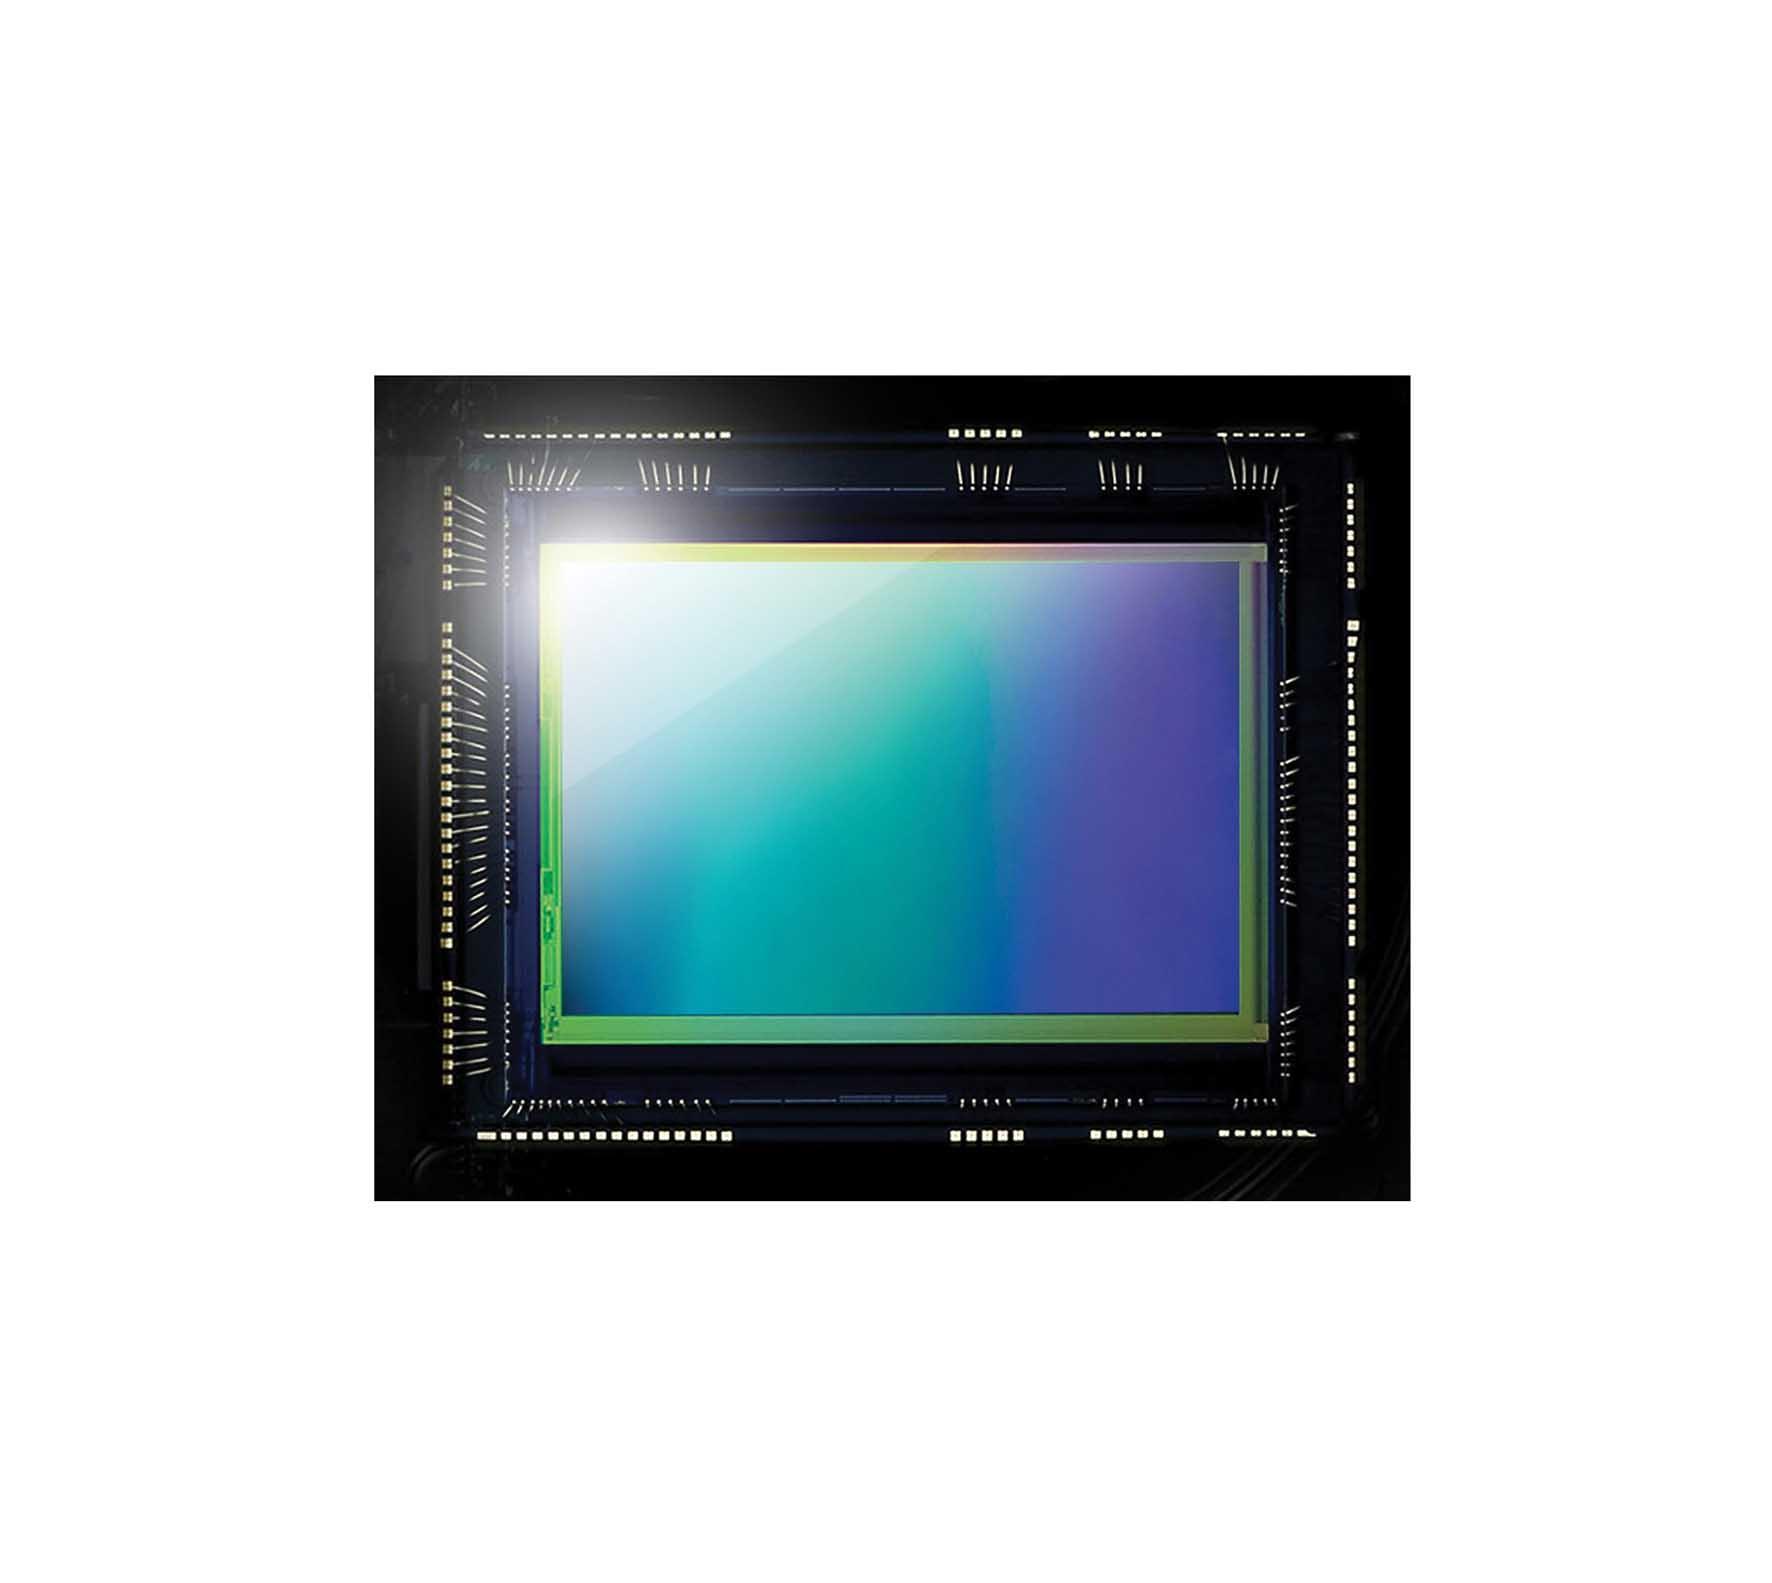 Fujifilm-sensore-X-M1-X-Trans-CMOS-ilnordest